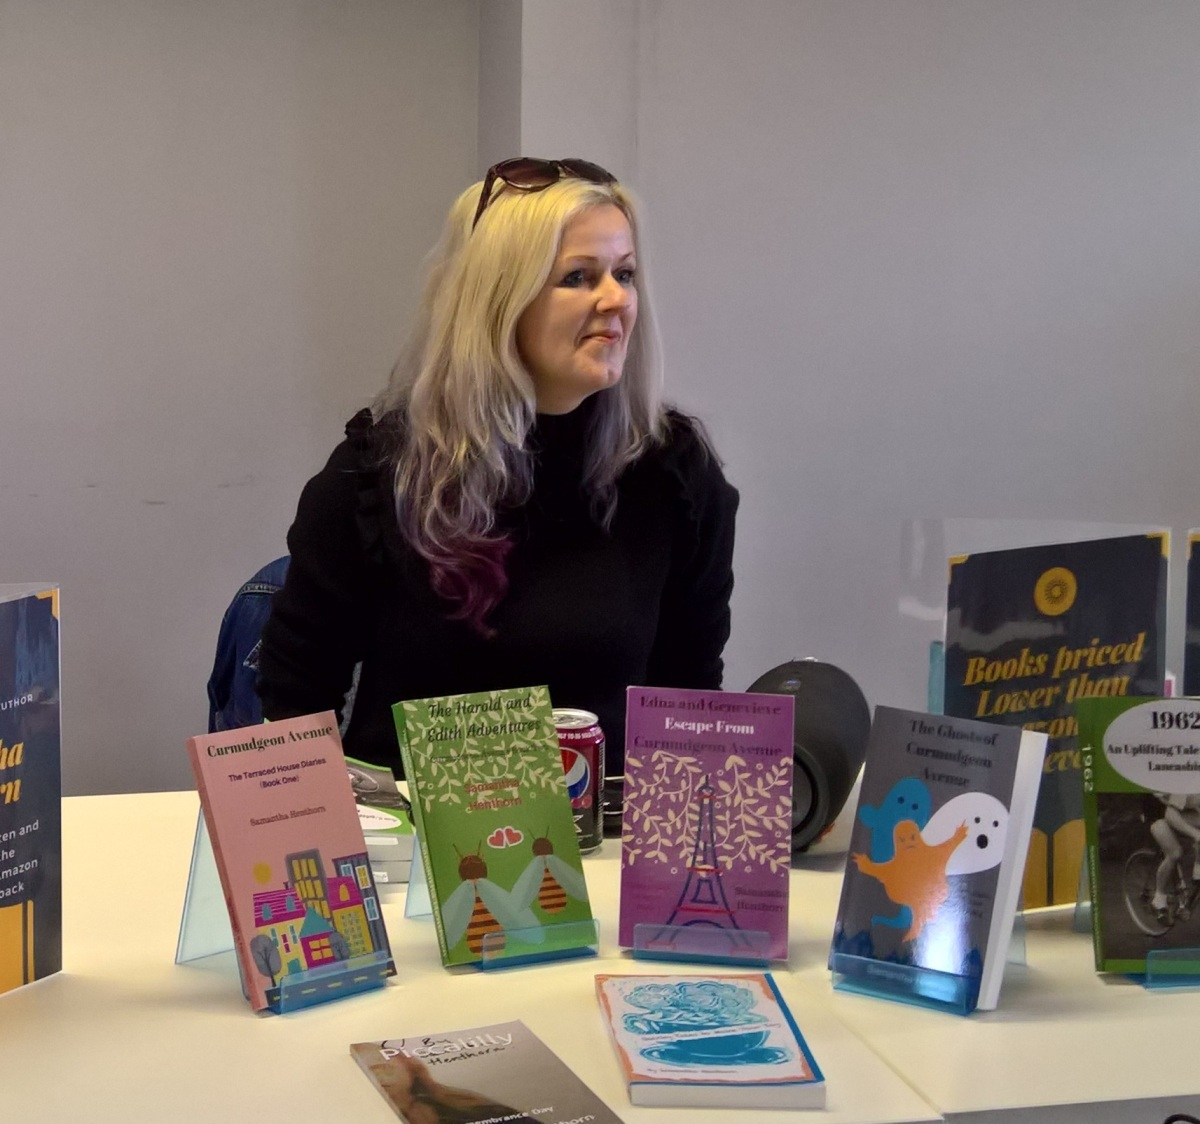 My #Author Talk at The Tottington Centre #CurmudgeonAvenue #AudiobookNews